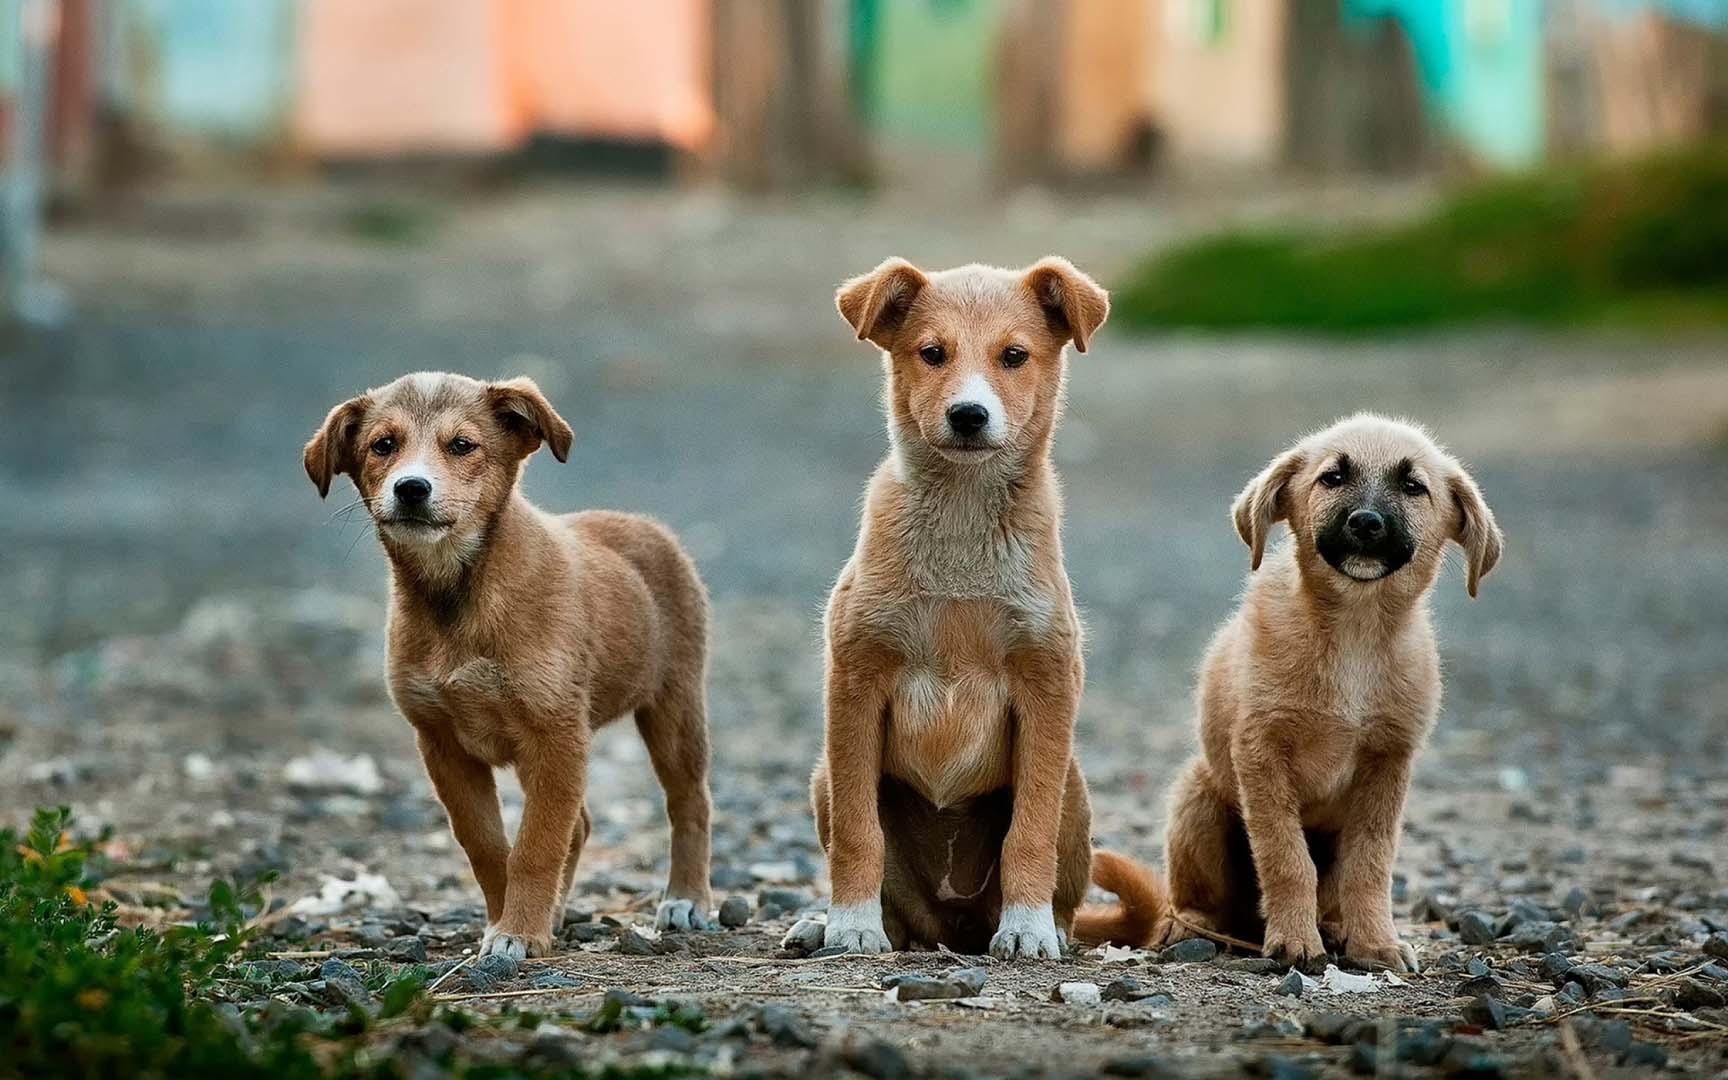 Tres perros mestizo miran a cámara con tres personalidades marcadas